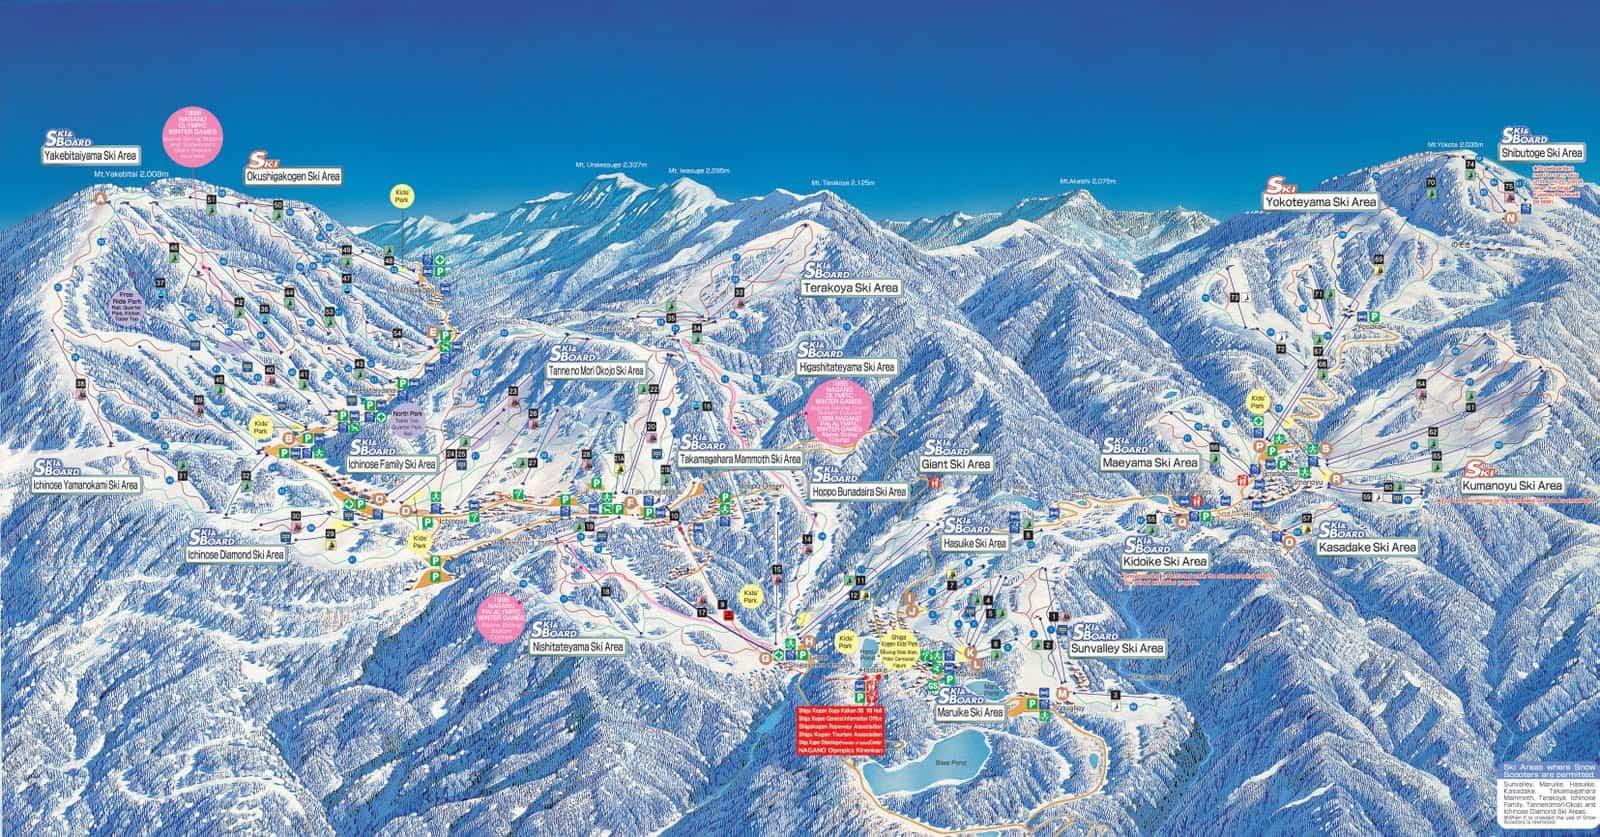 Shiga Kogen map